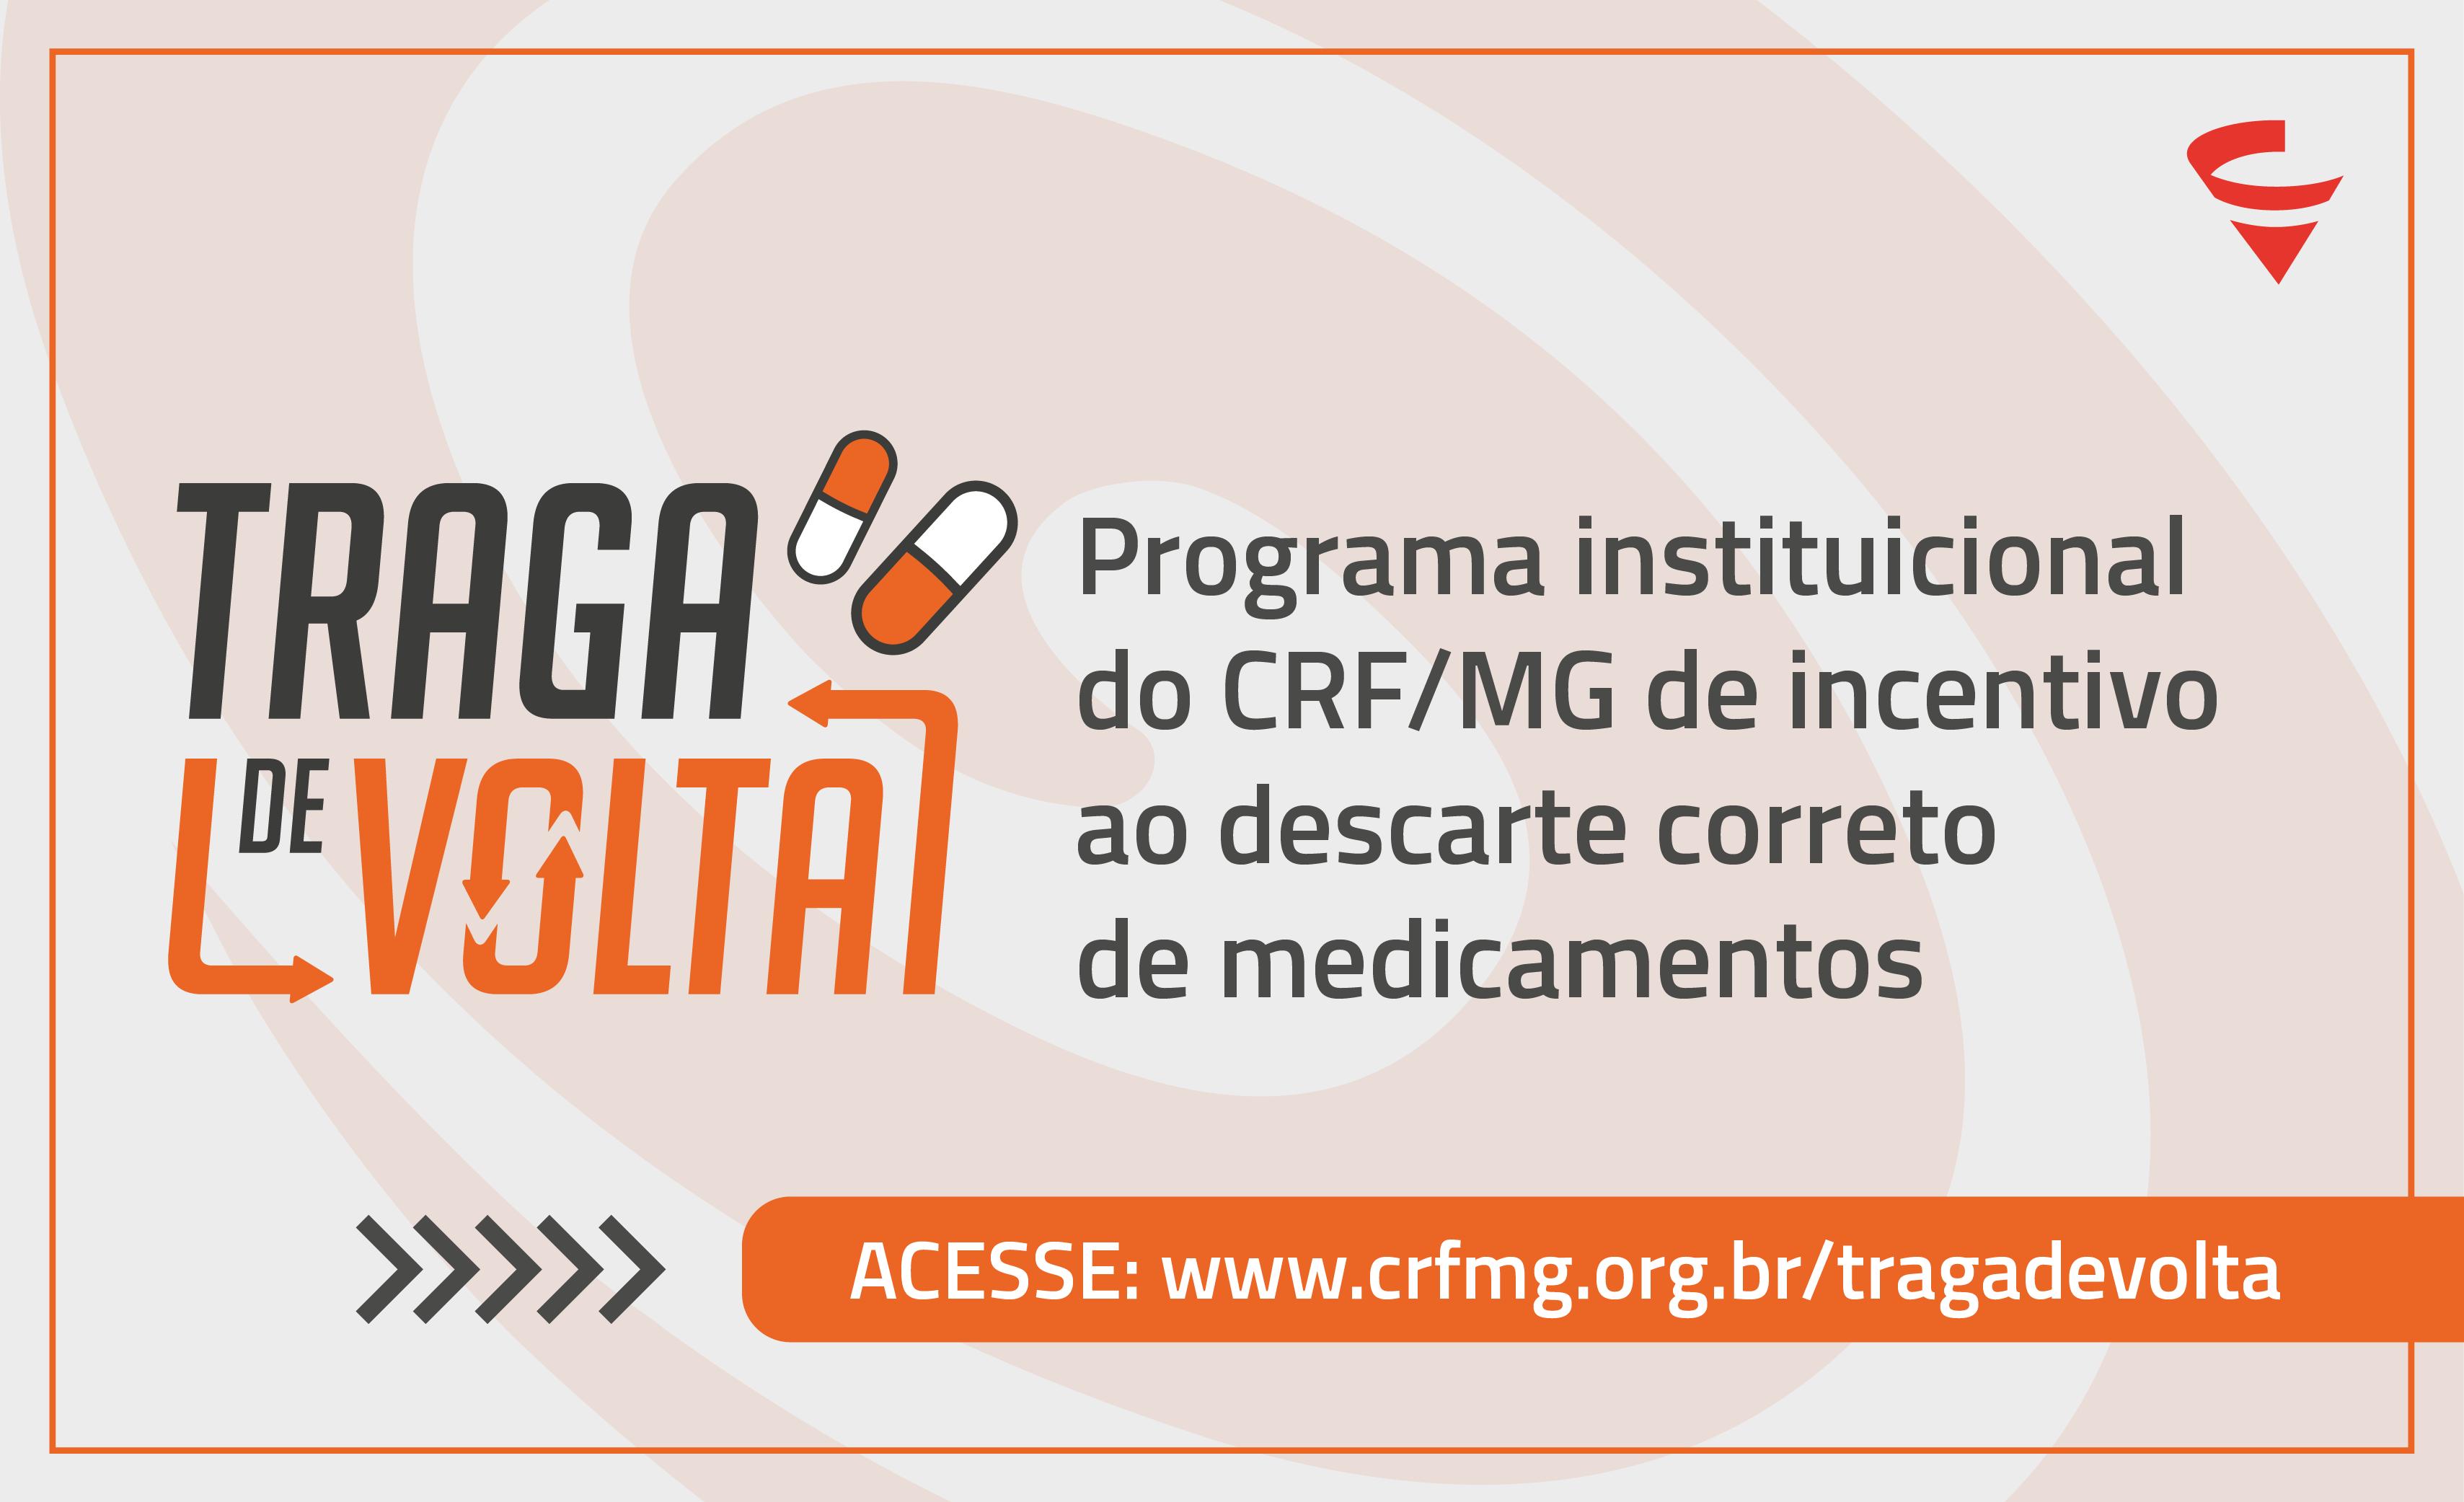 CRF/MG reativa o programa Traga de Volta de descarte de medicamentos